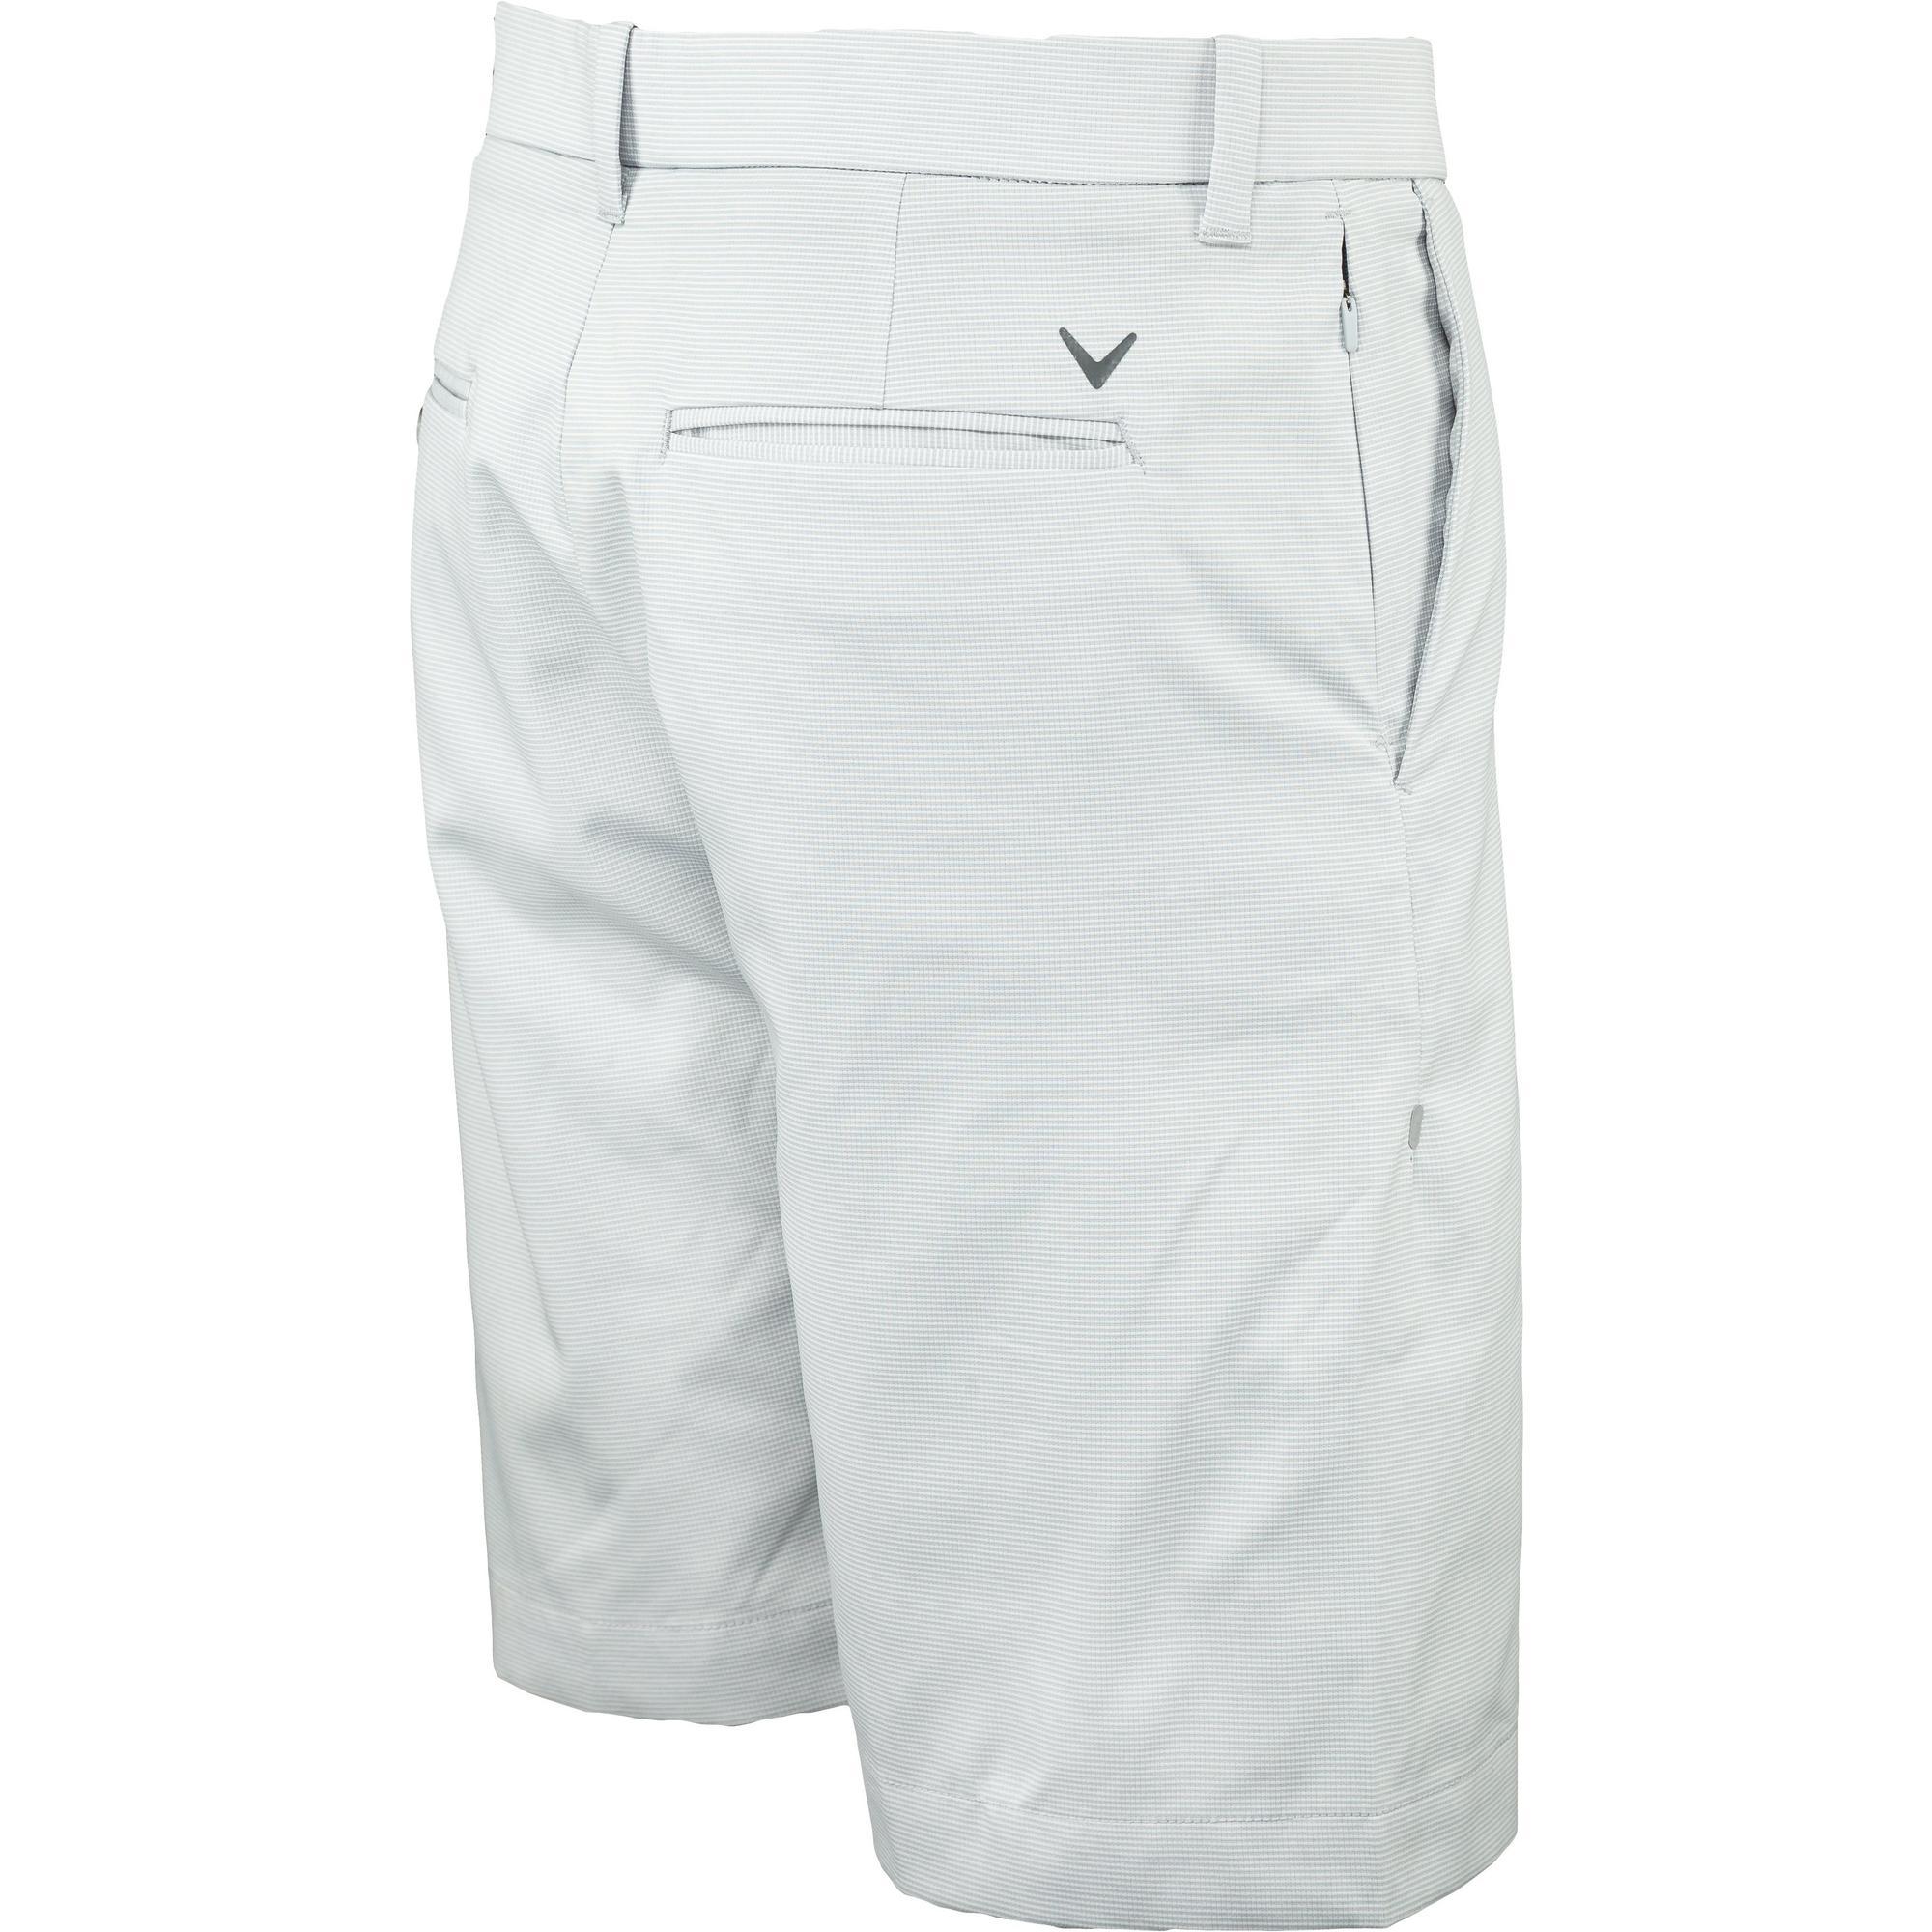 Men's Horizontal Yarn-Dyed Ergo Short